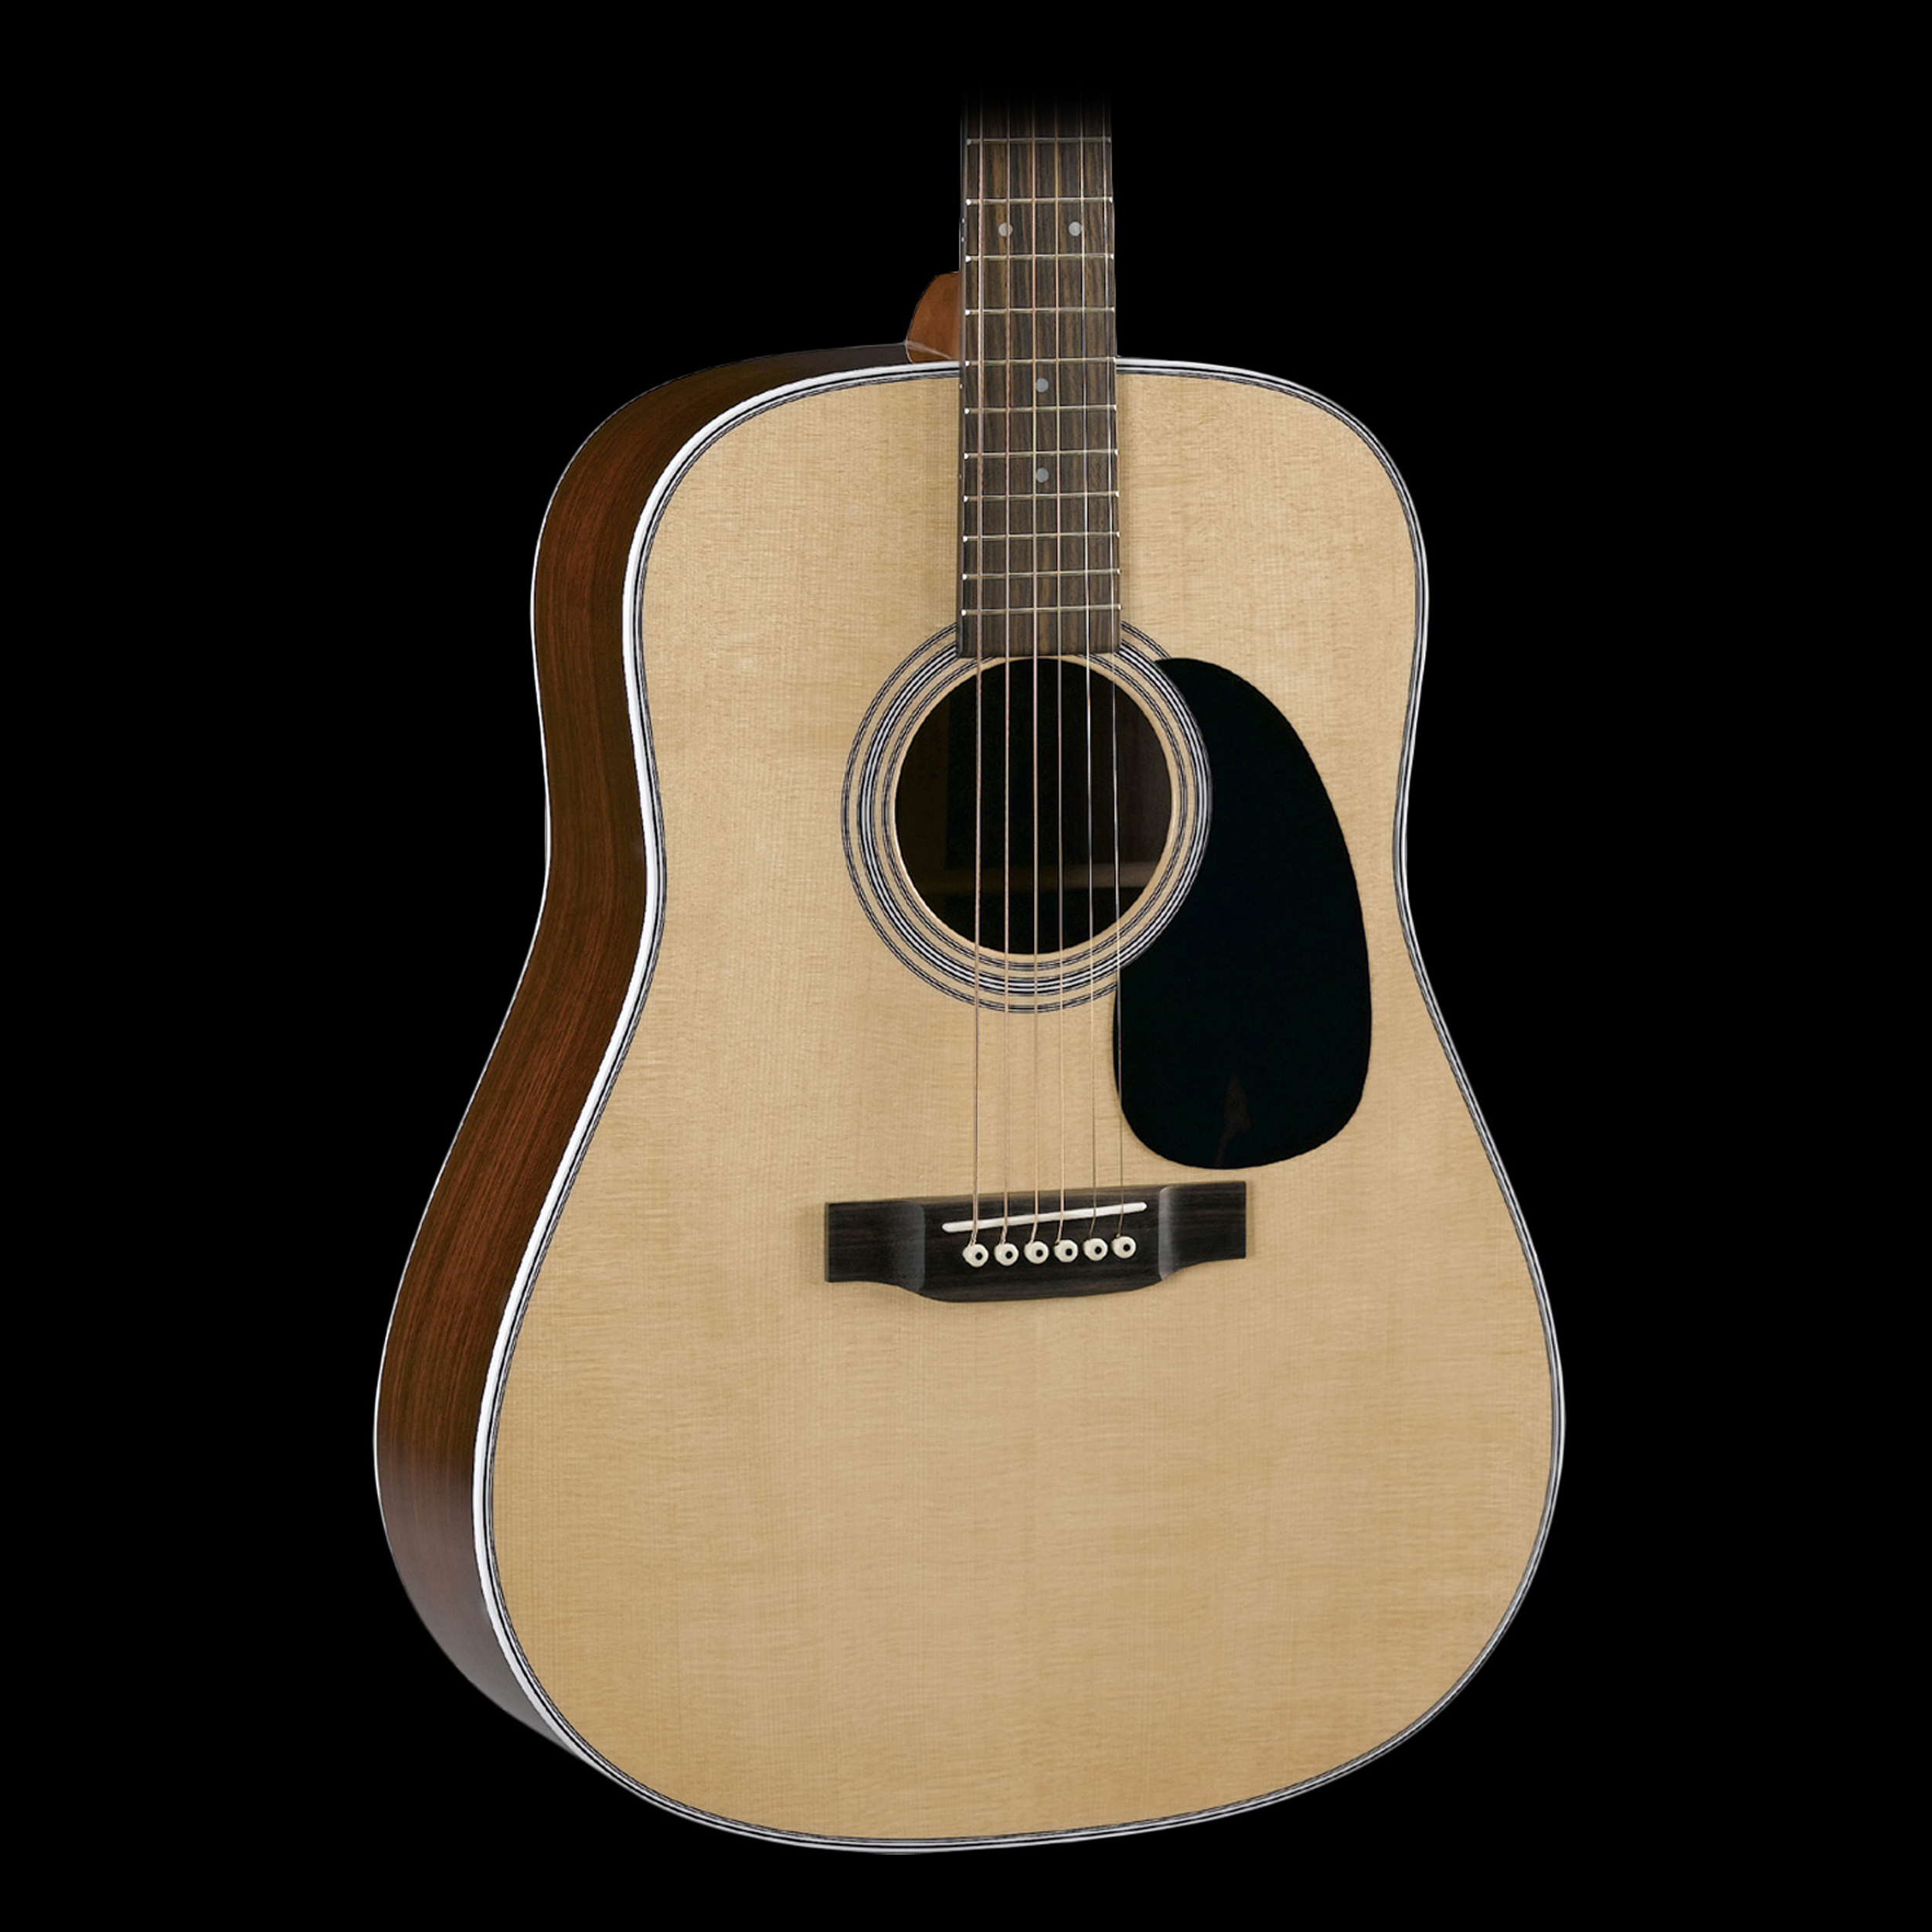 martin d 28 dreadnought acoustic guitar 729789010405 ebay. Black Bedroom Furniture Sets. Home Design Ideas